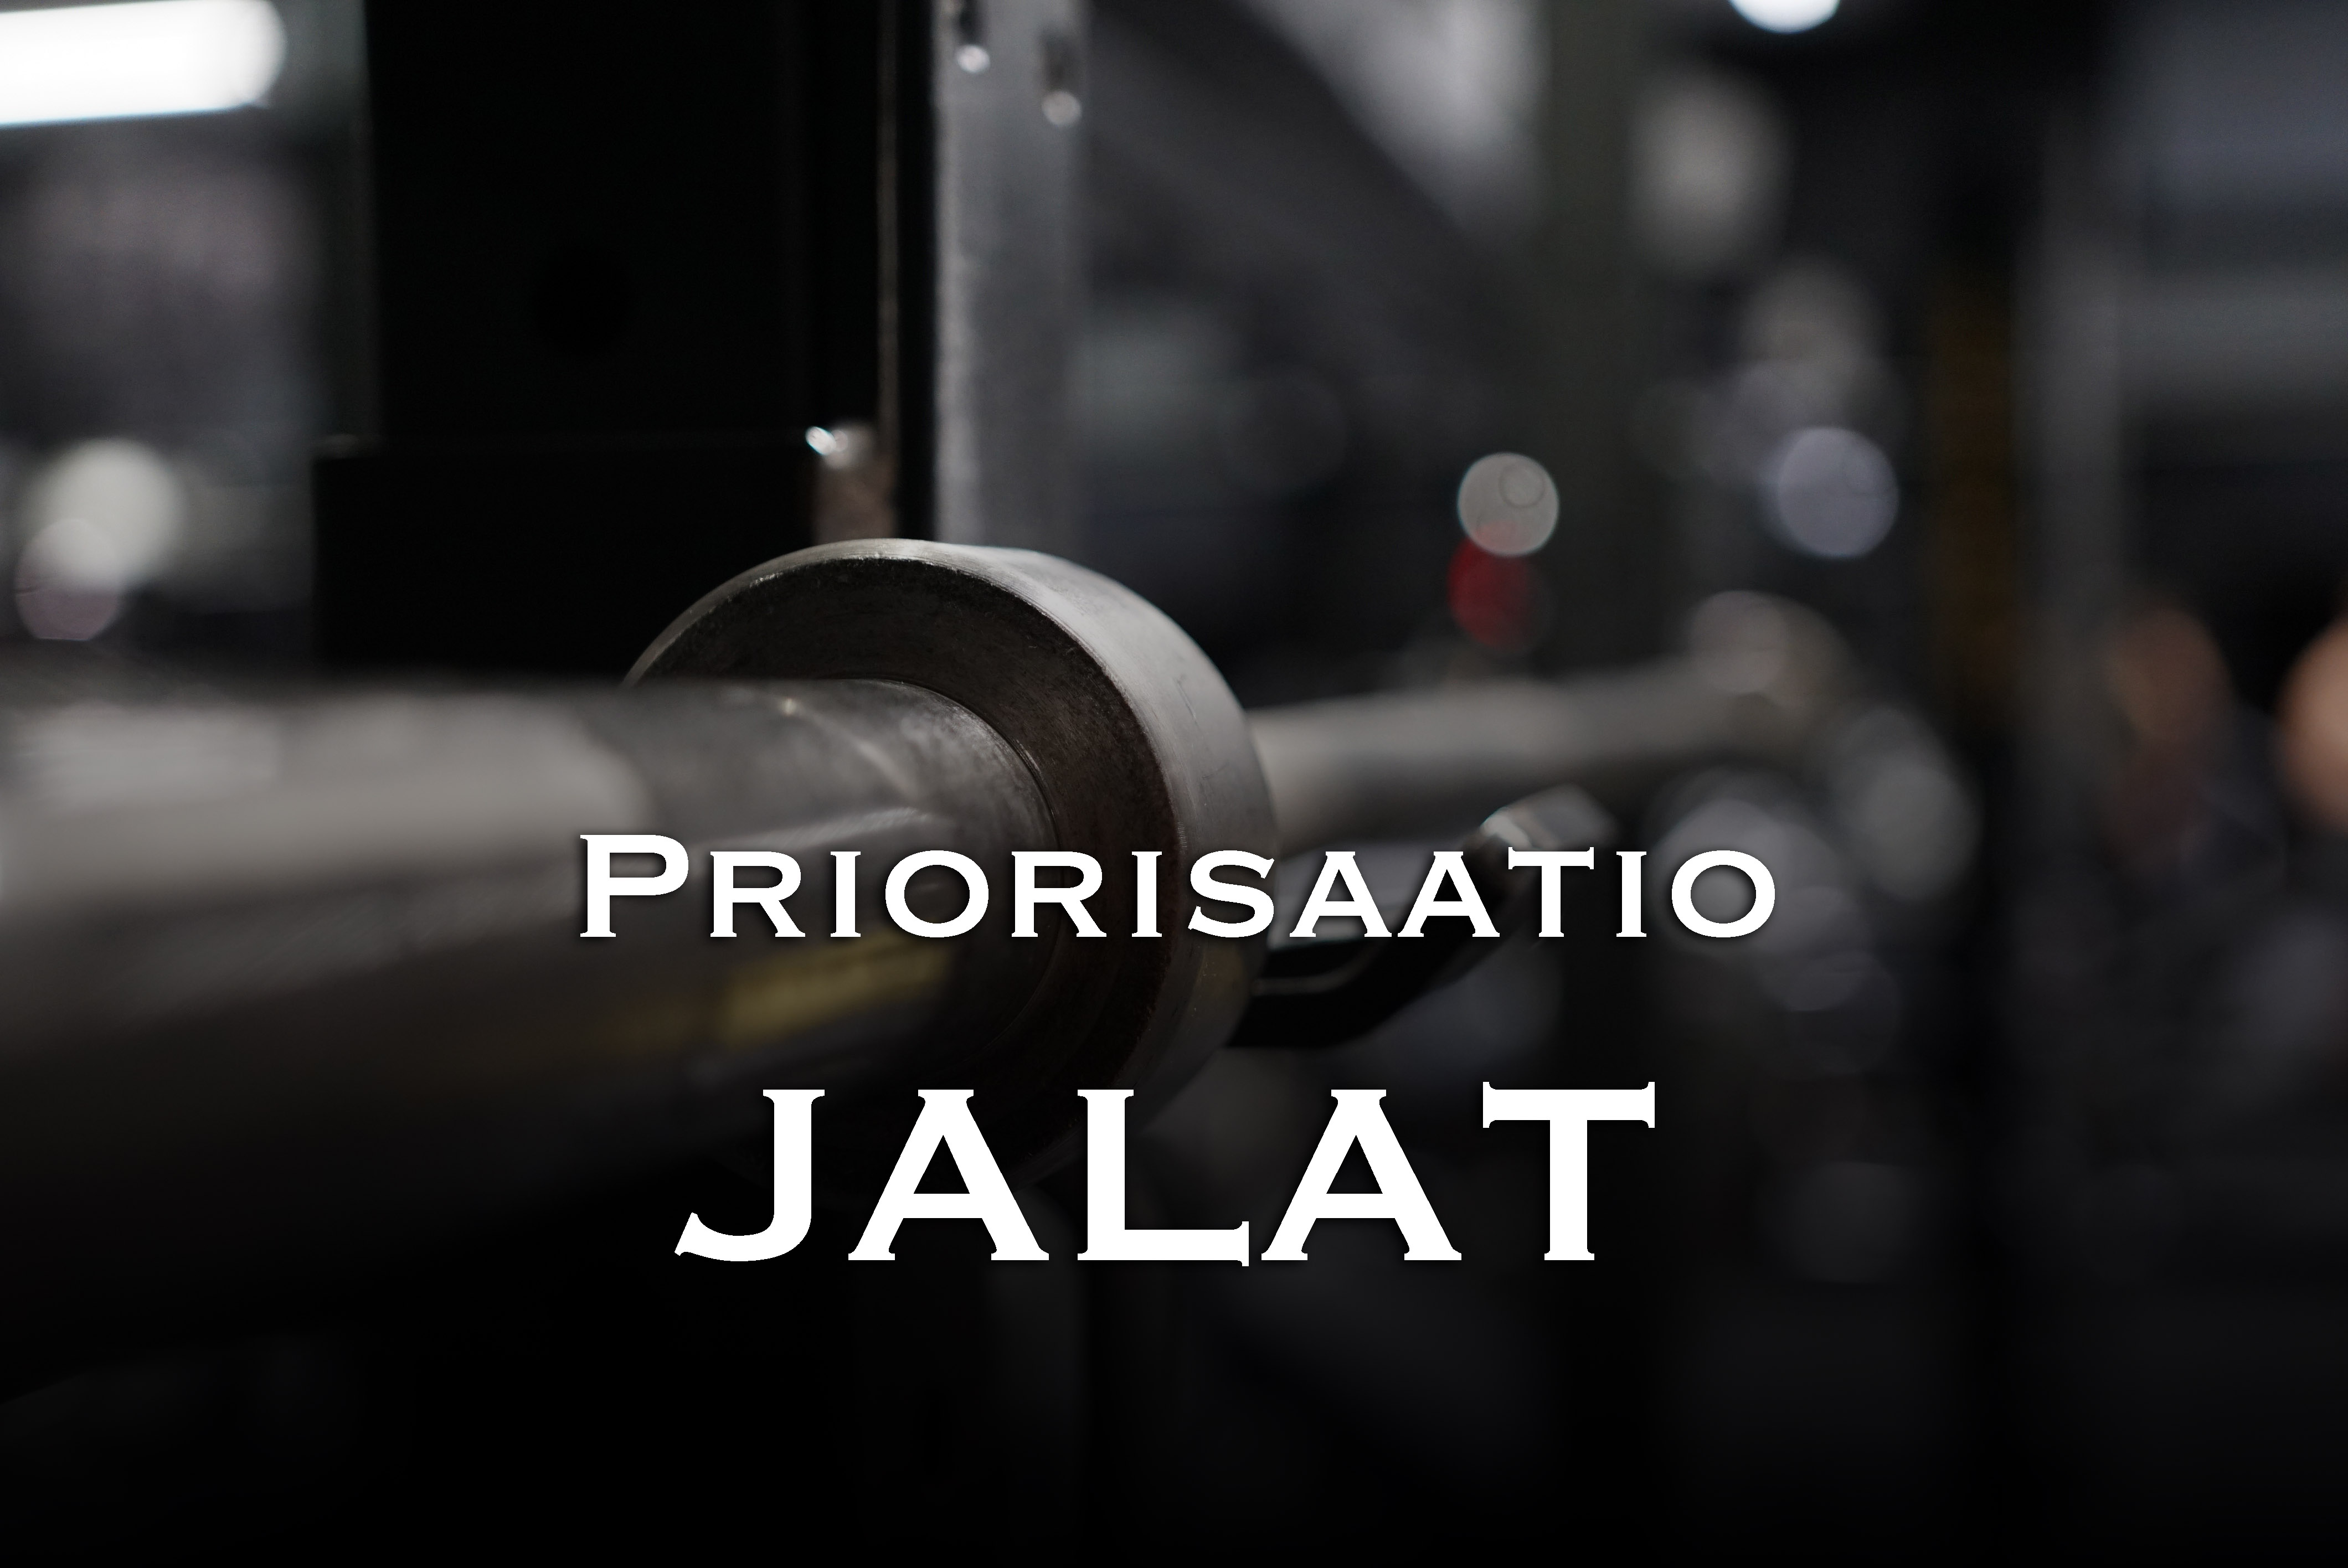 Priorisaatio Jalat